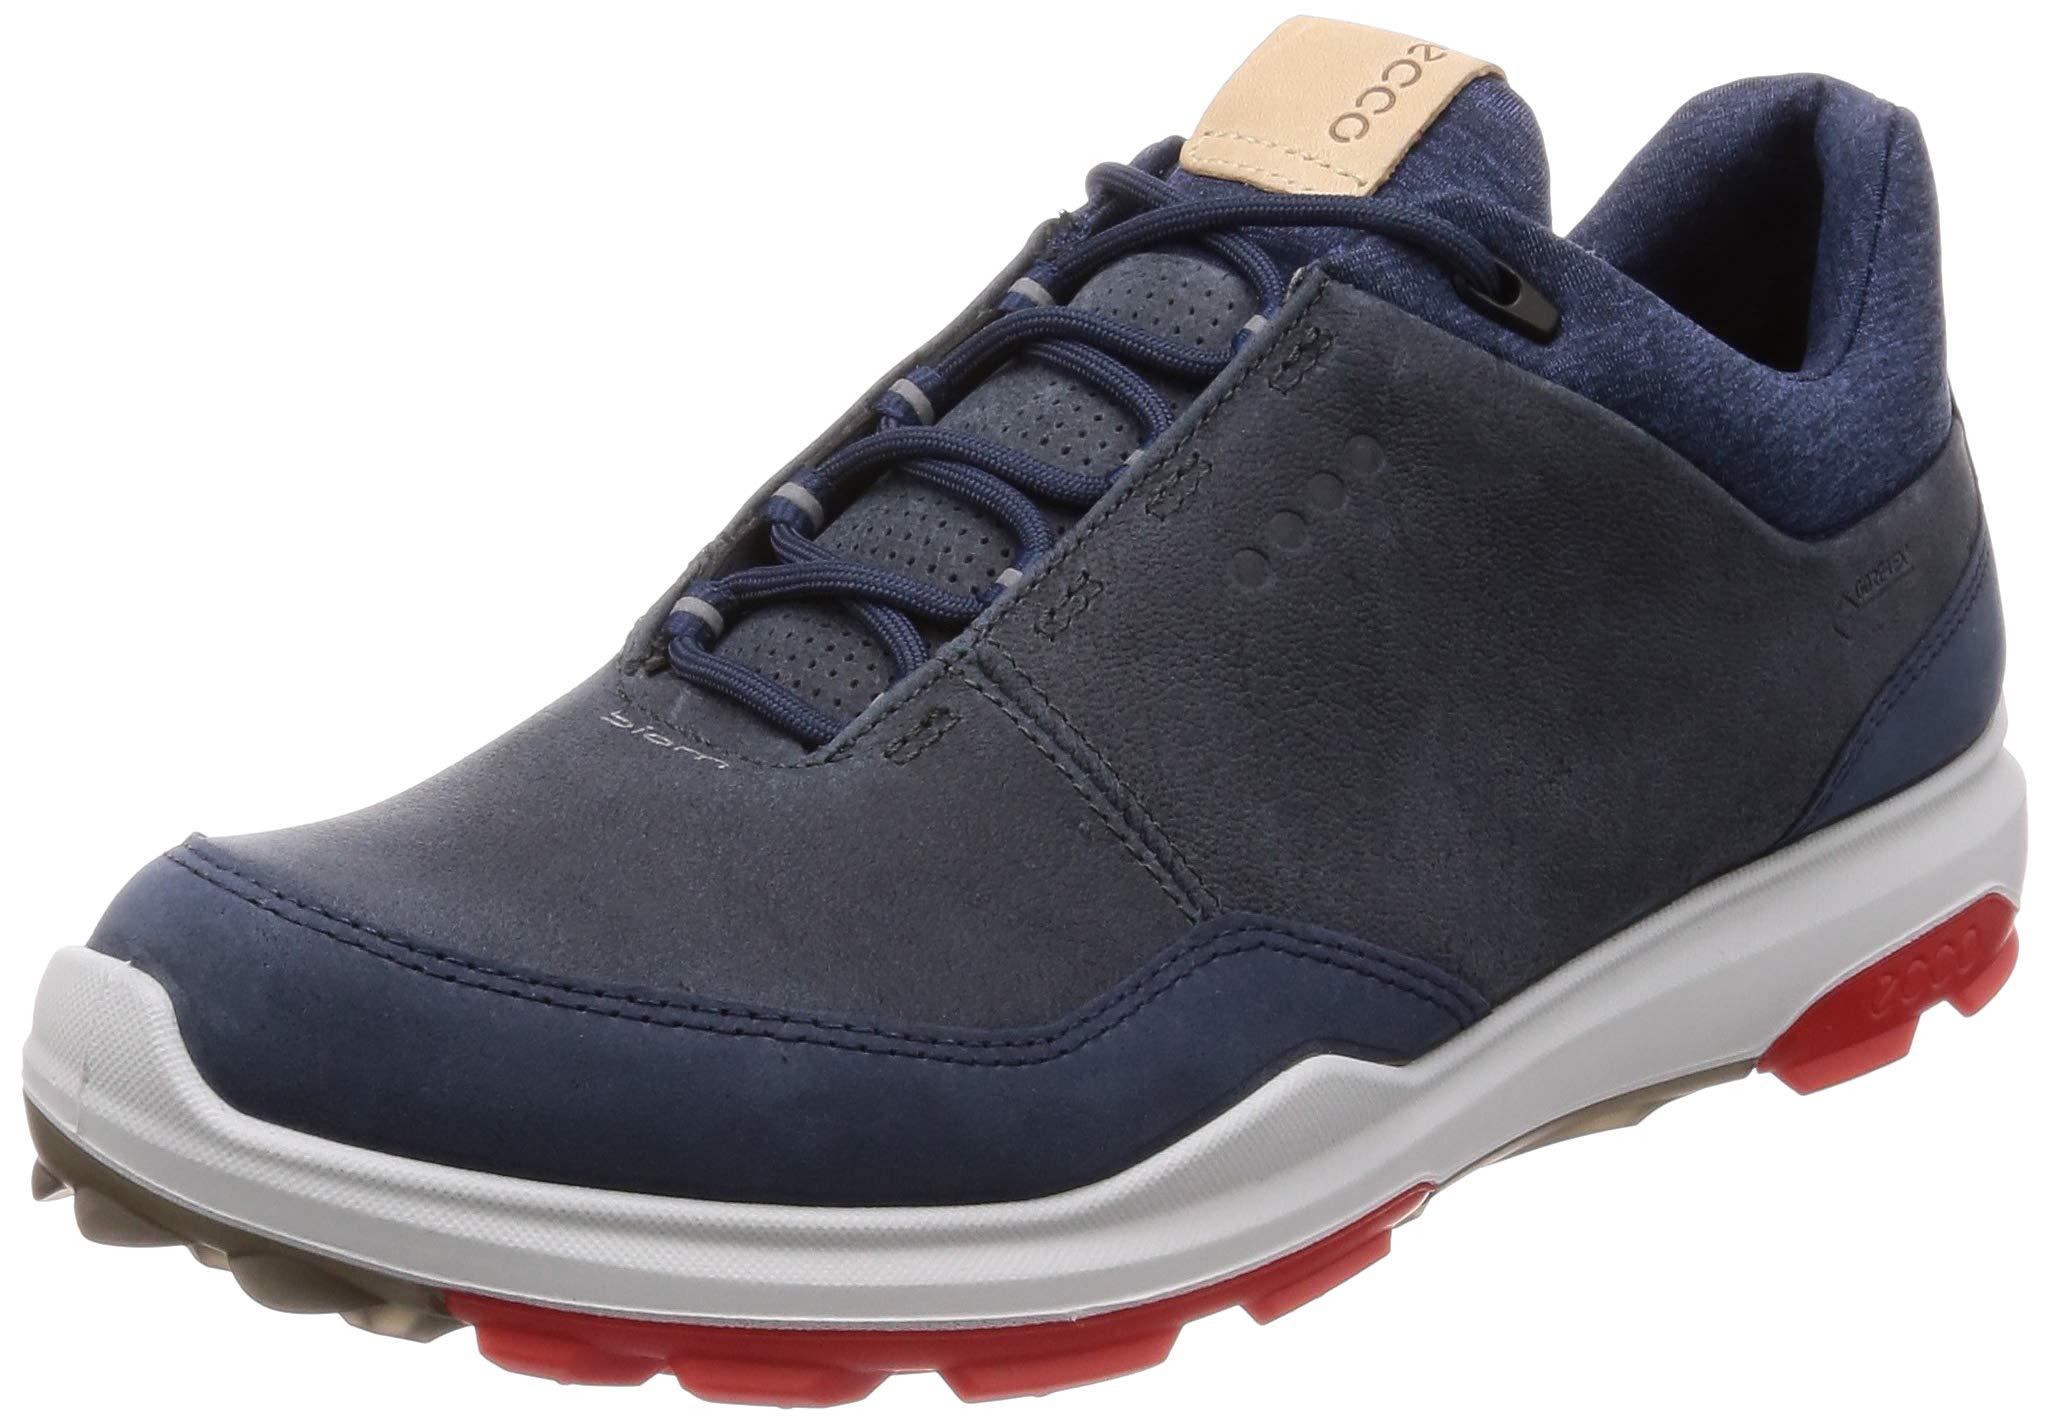 ECCO Men's Biom Hybrid 3 Gore-TEX Golf Shoe, Ombre Yak Nubuck, 6 M US by ECCO